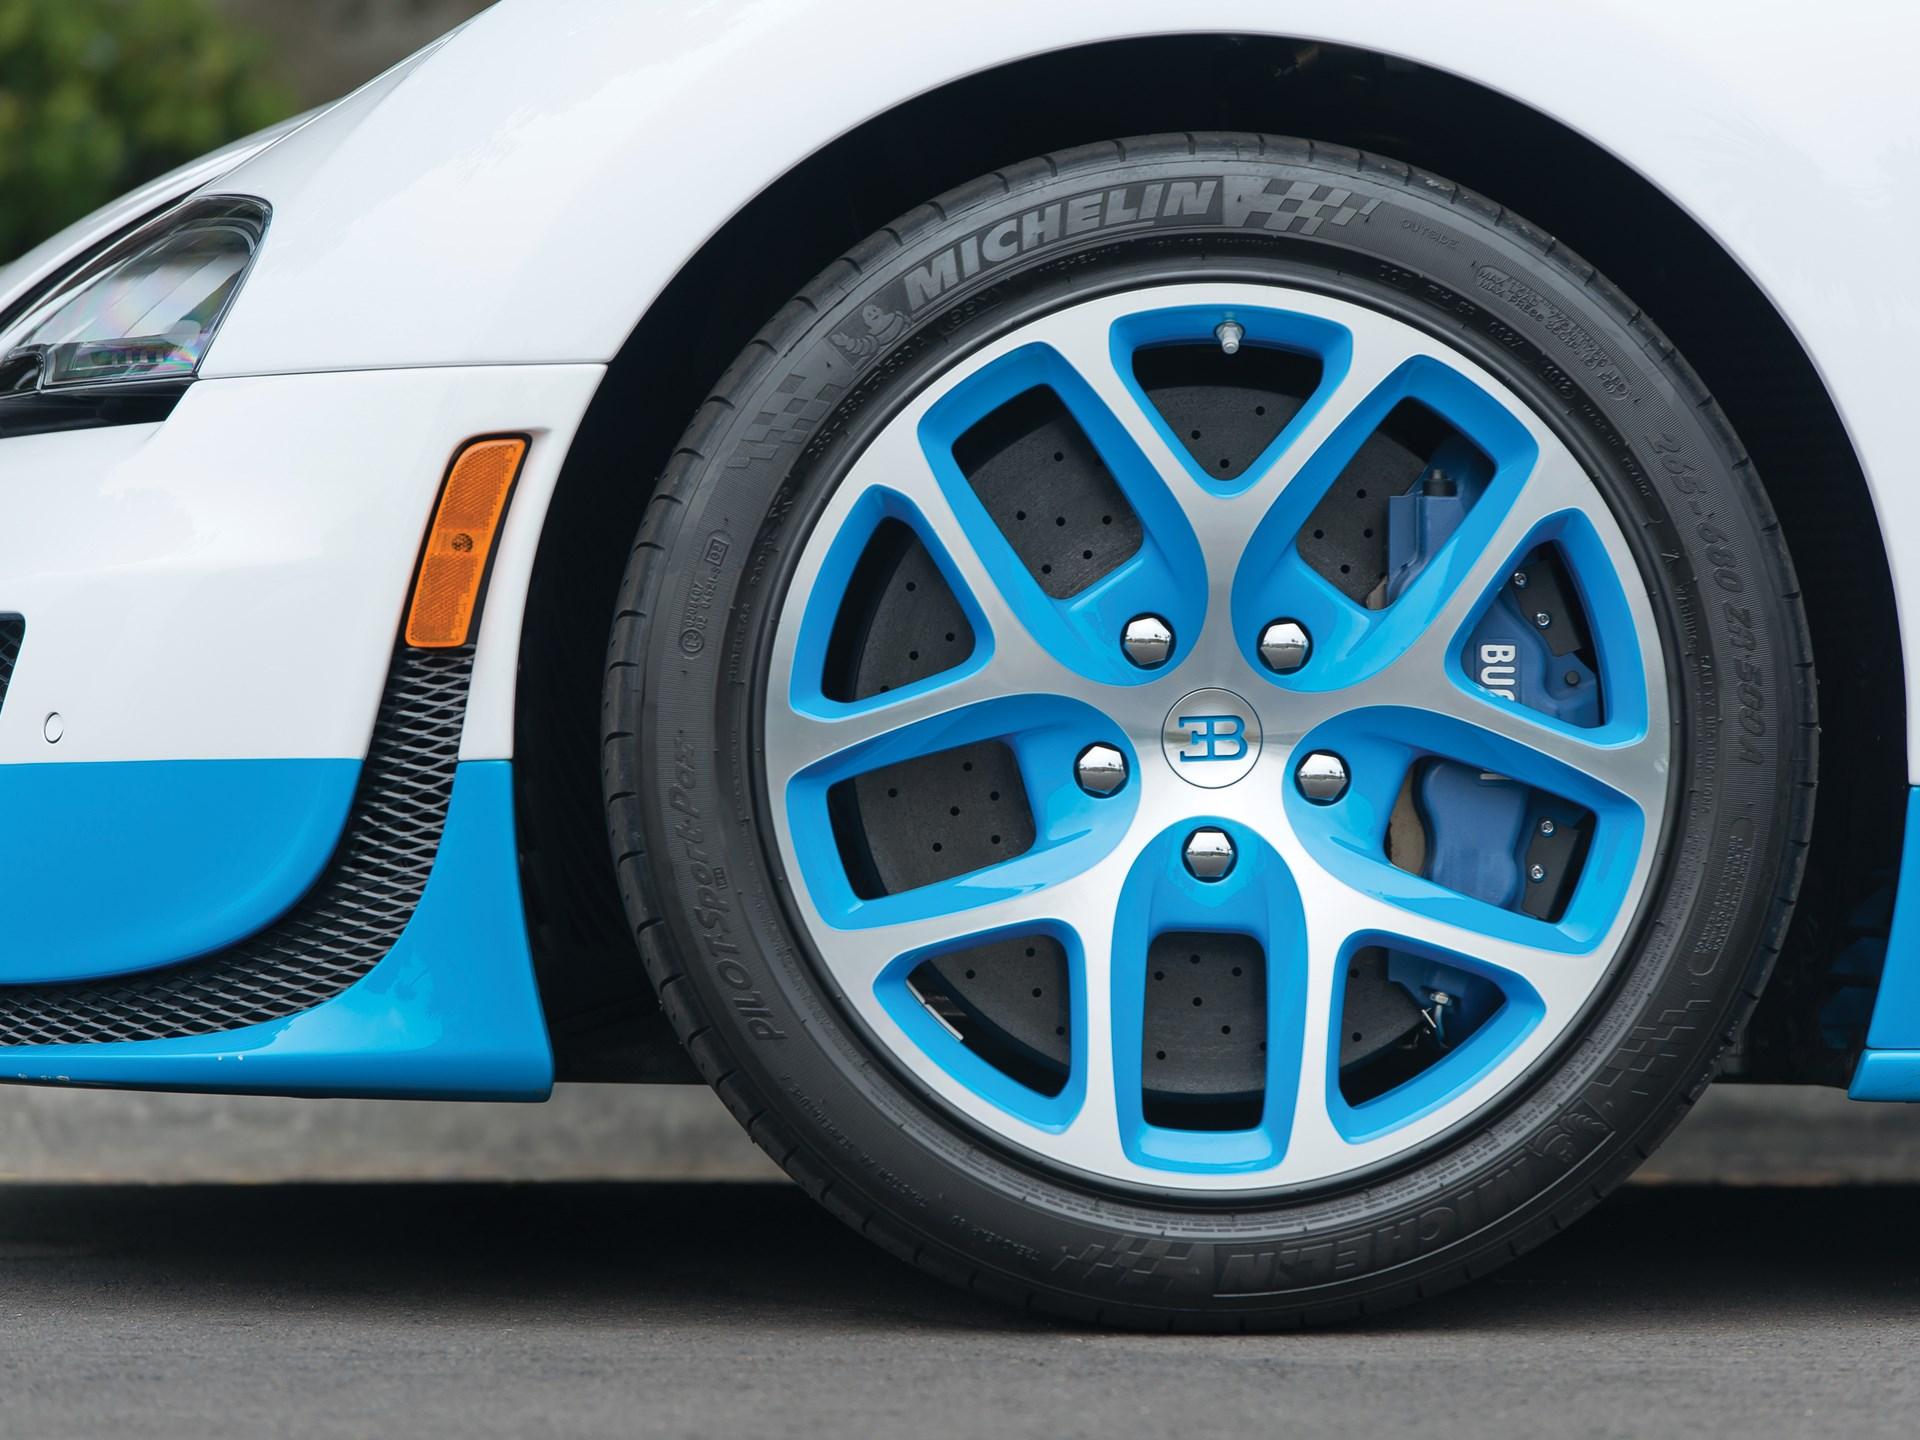 2013 Bugatti Veyron 16.4 Grand Sport Vitesse 'Le Ciel Californien'